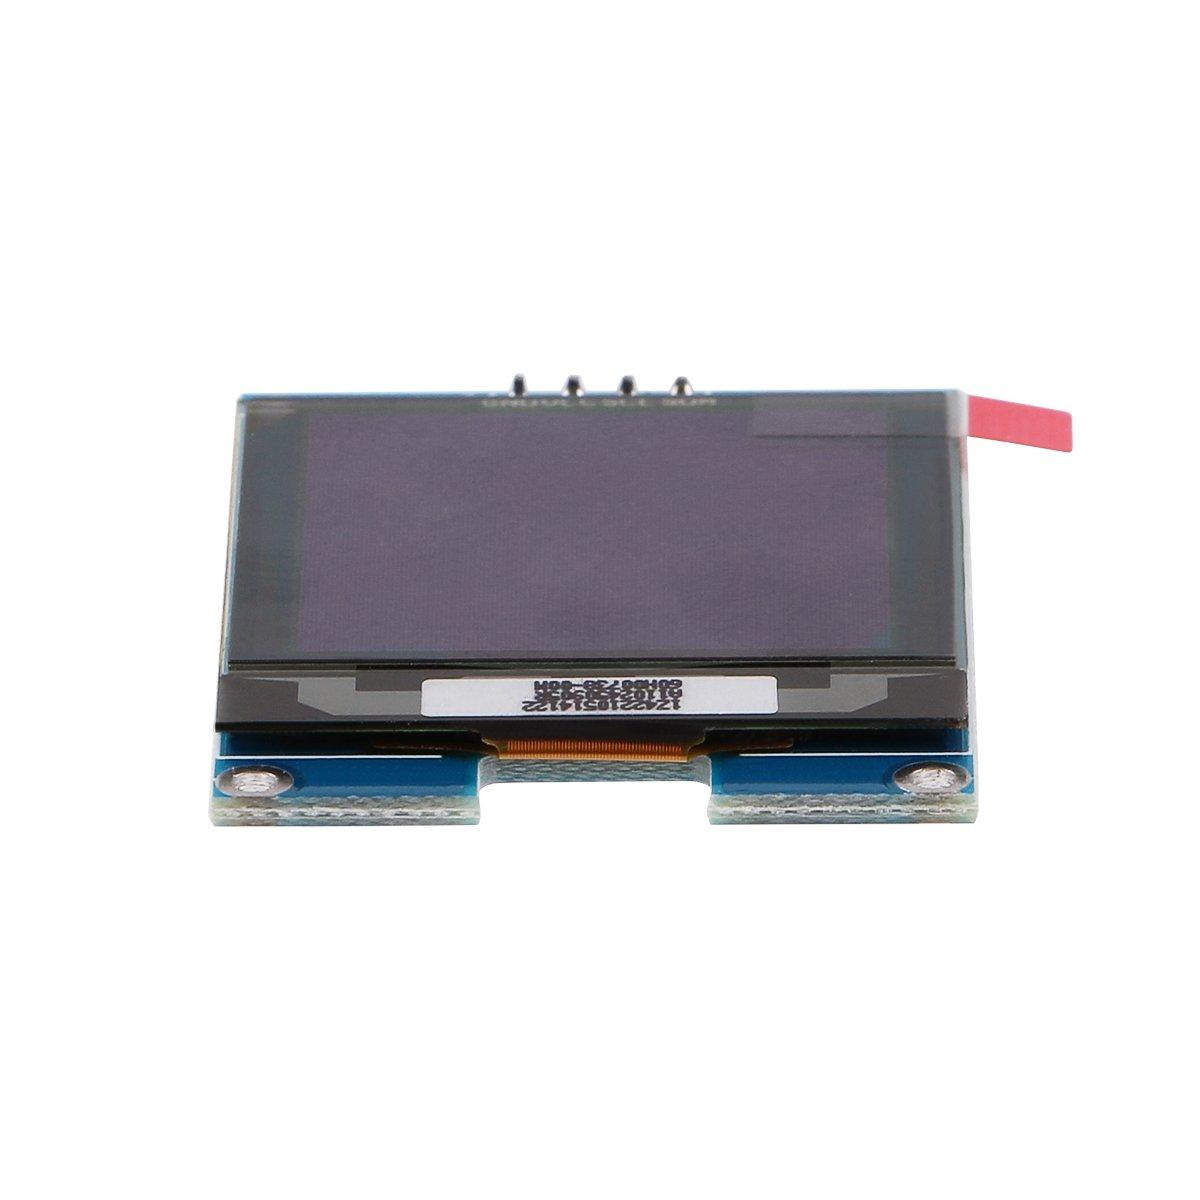 MakerHawk I2C OLED Display Module 1 5 Inch OLED Module Arduino LCD